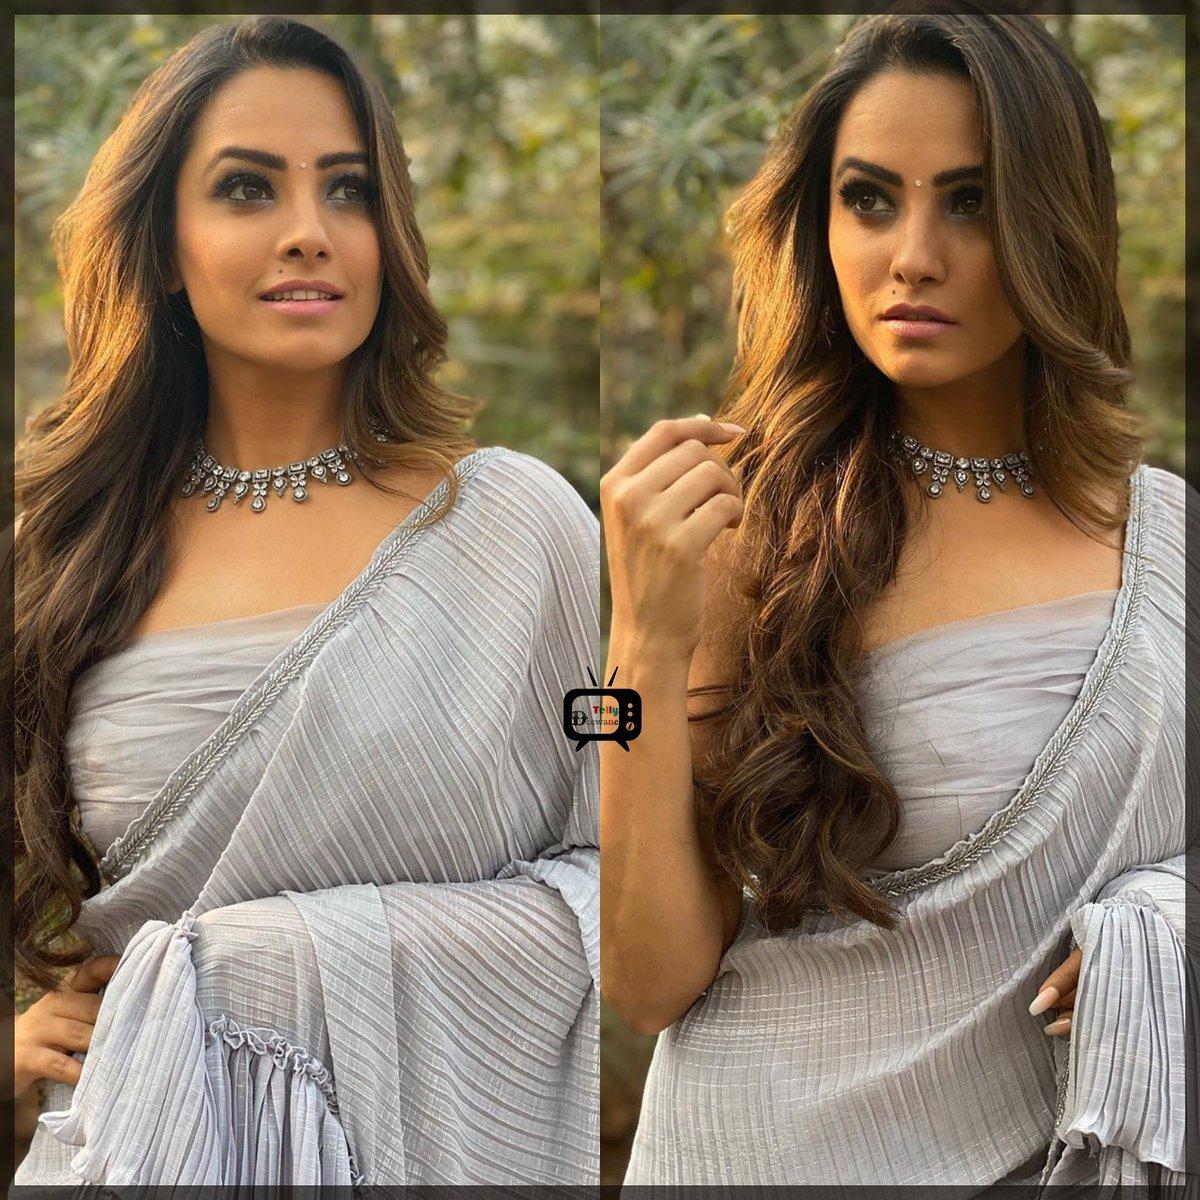 Gorgeous Anita Hassanandani #AnitaHassanandani #Naagin4  #AnitaHassanandaniReddy #Vishaka #Vish  #Naagin3 #Shagun #YHM  @TellyDeewanepic.twitter.com/8IFph5zfjs